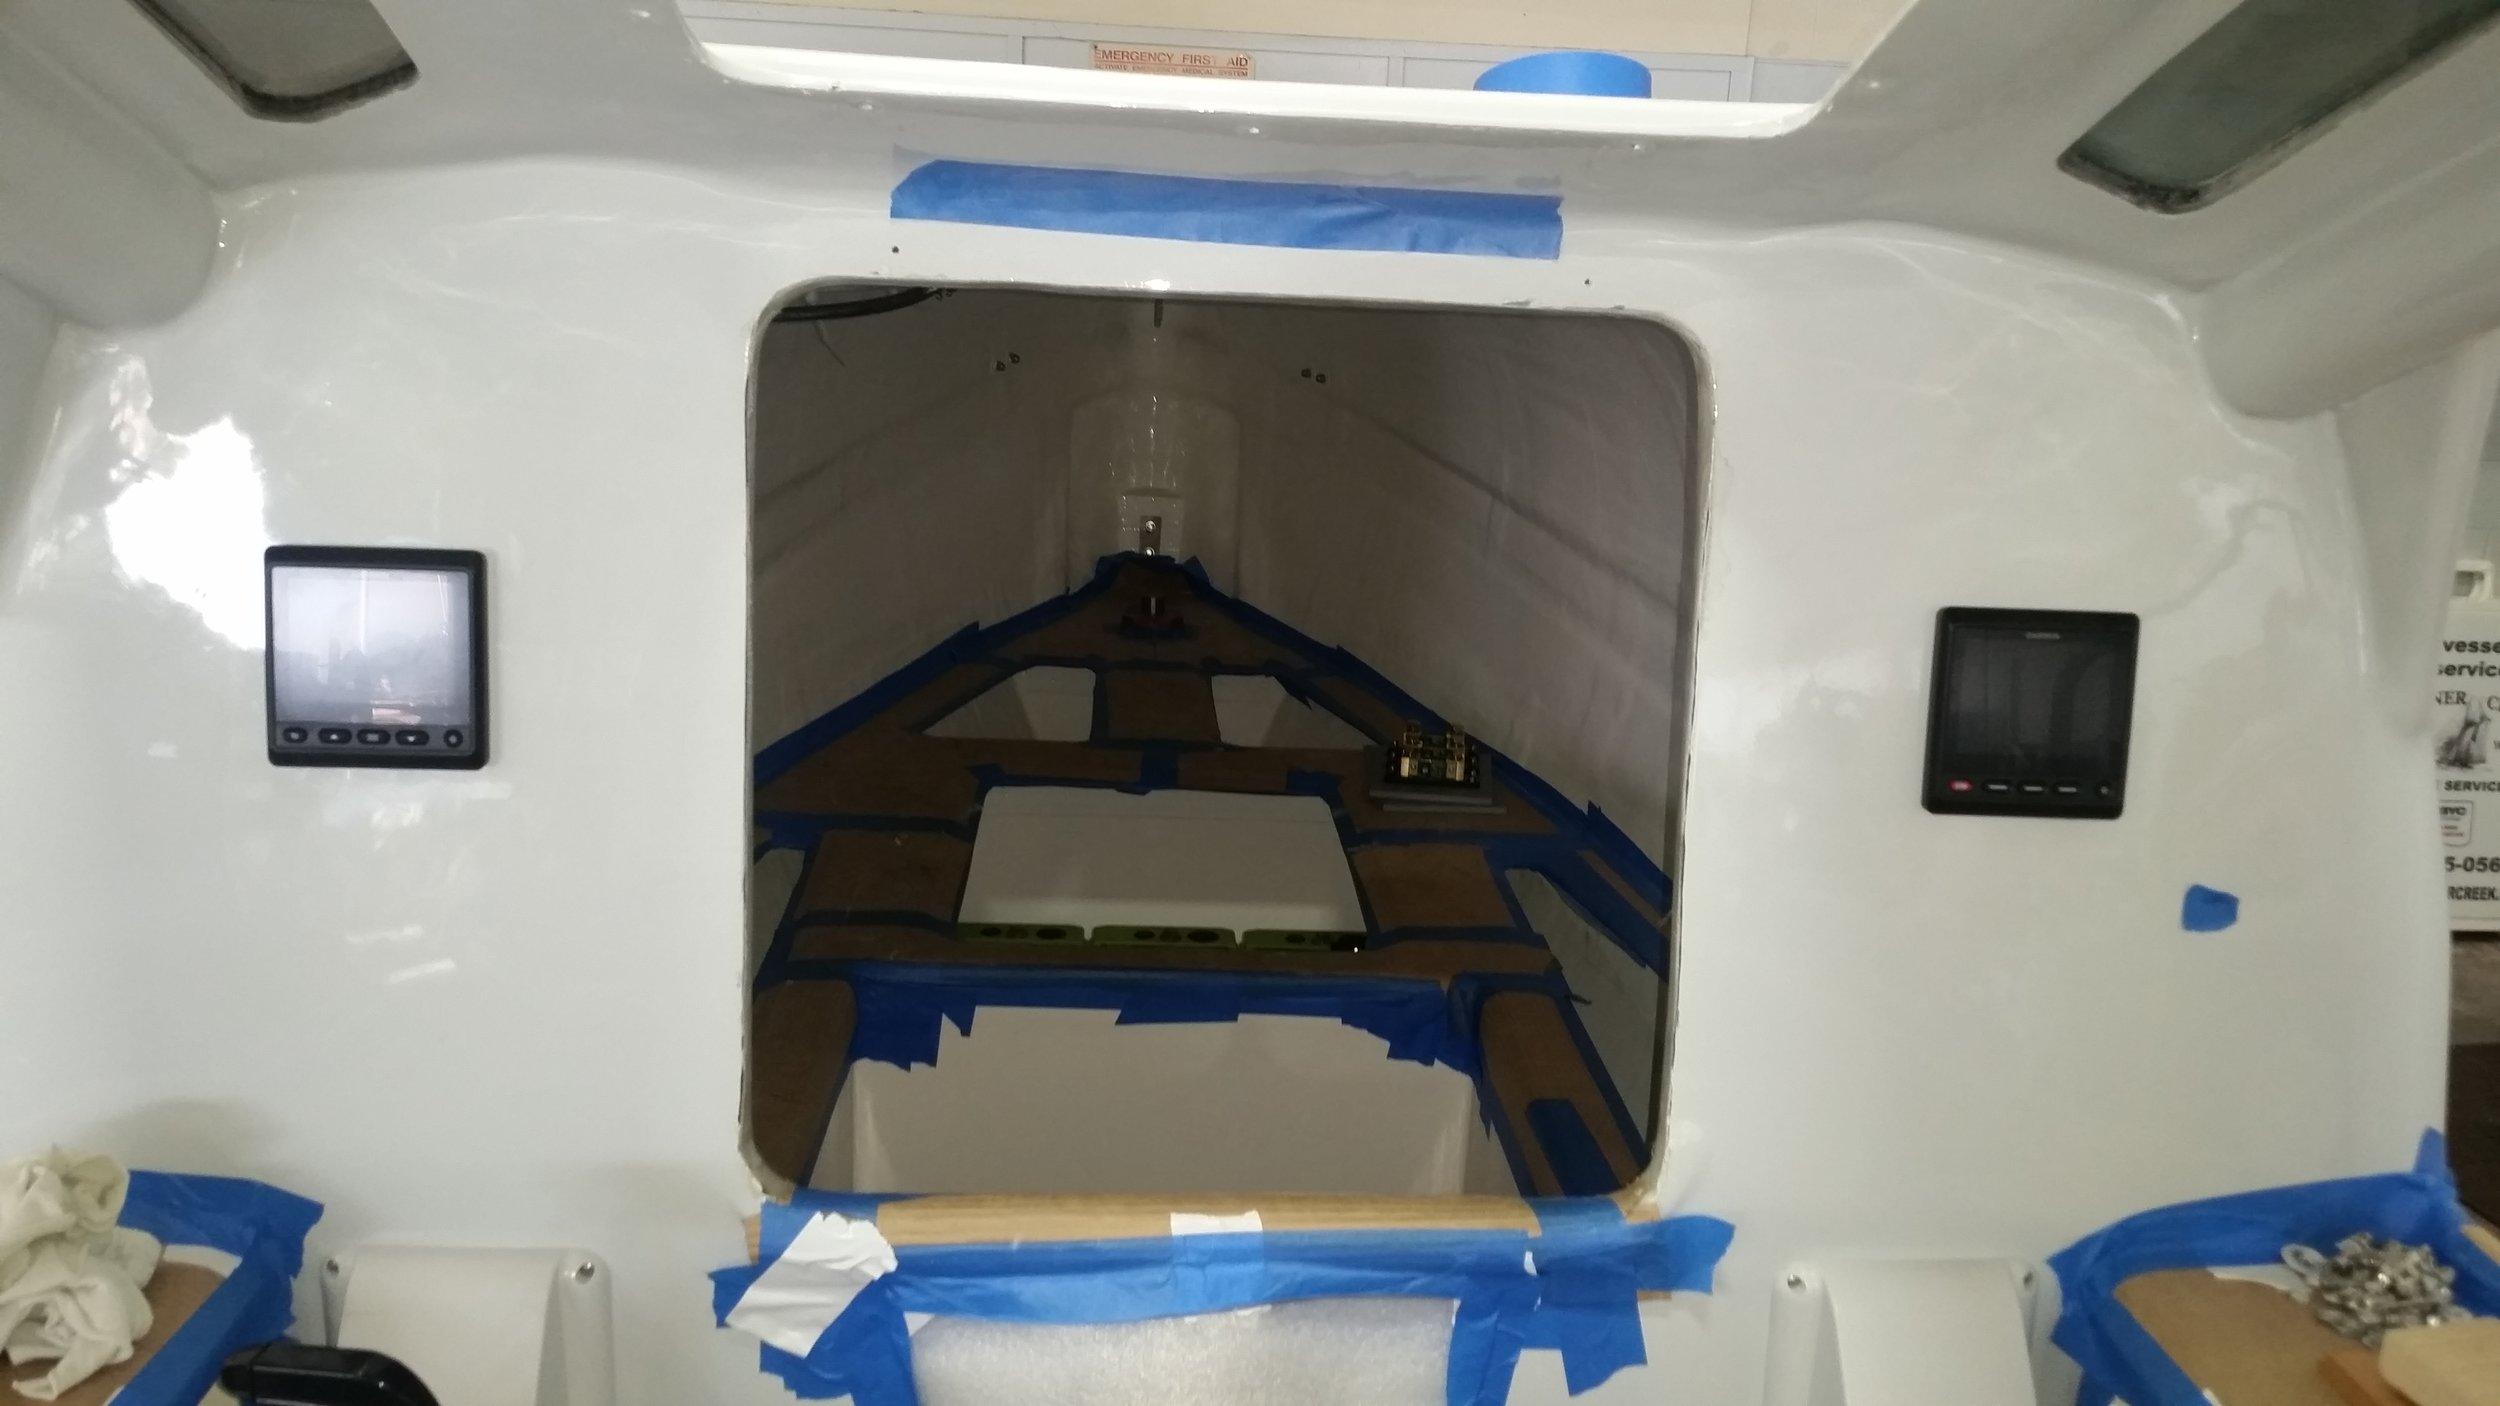 Cockpit Displays